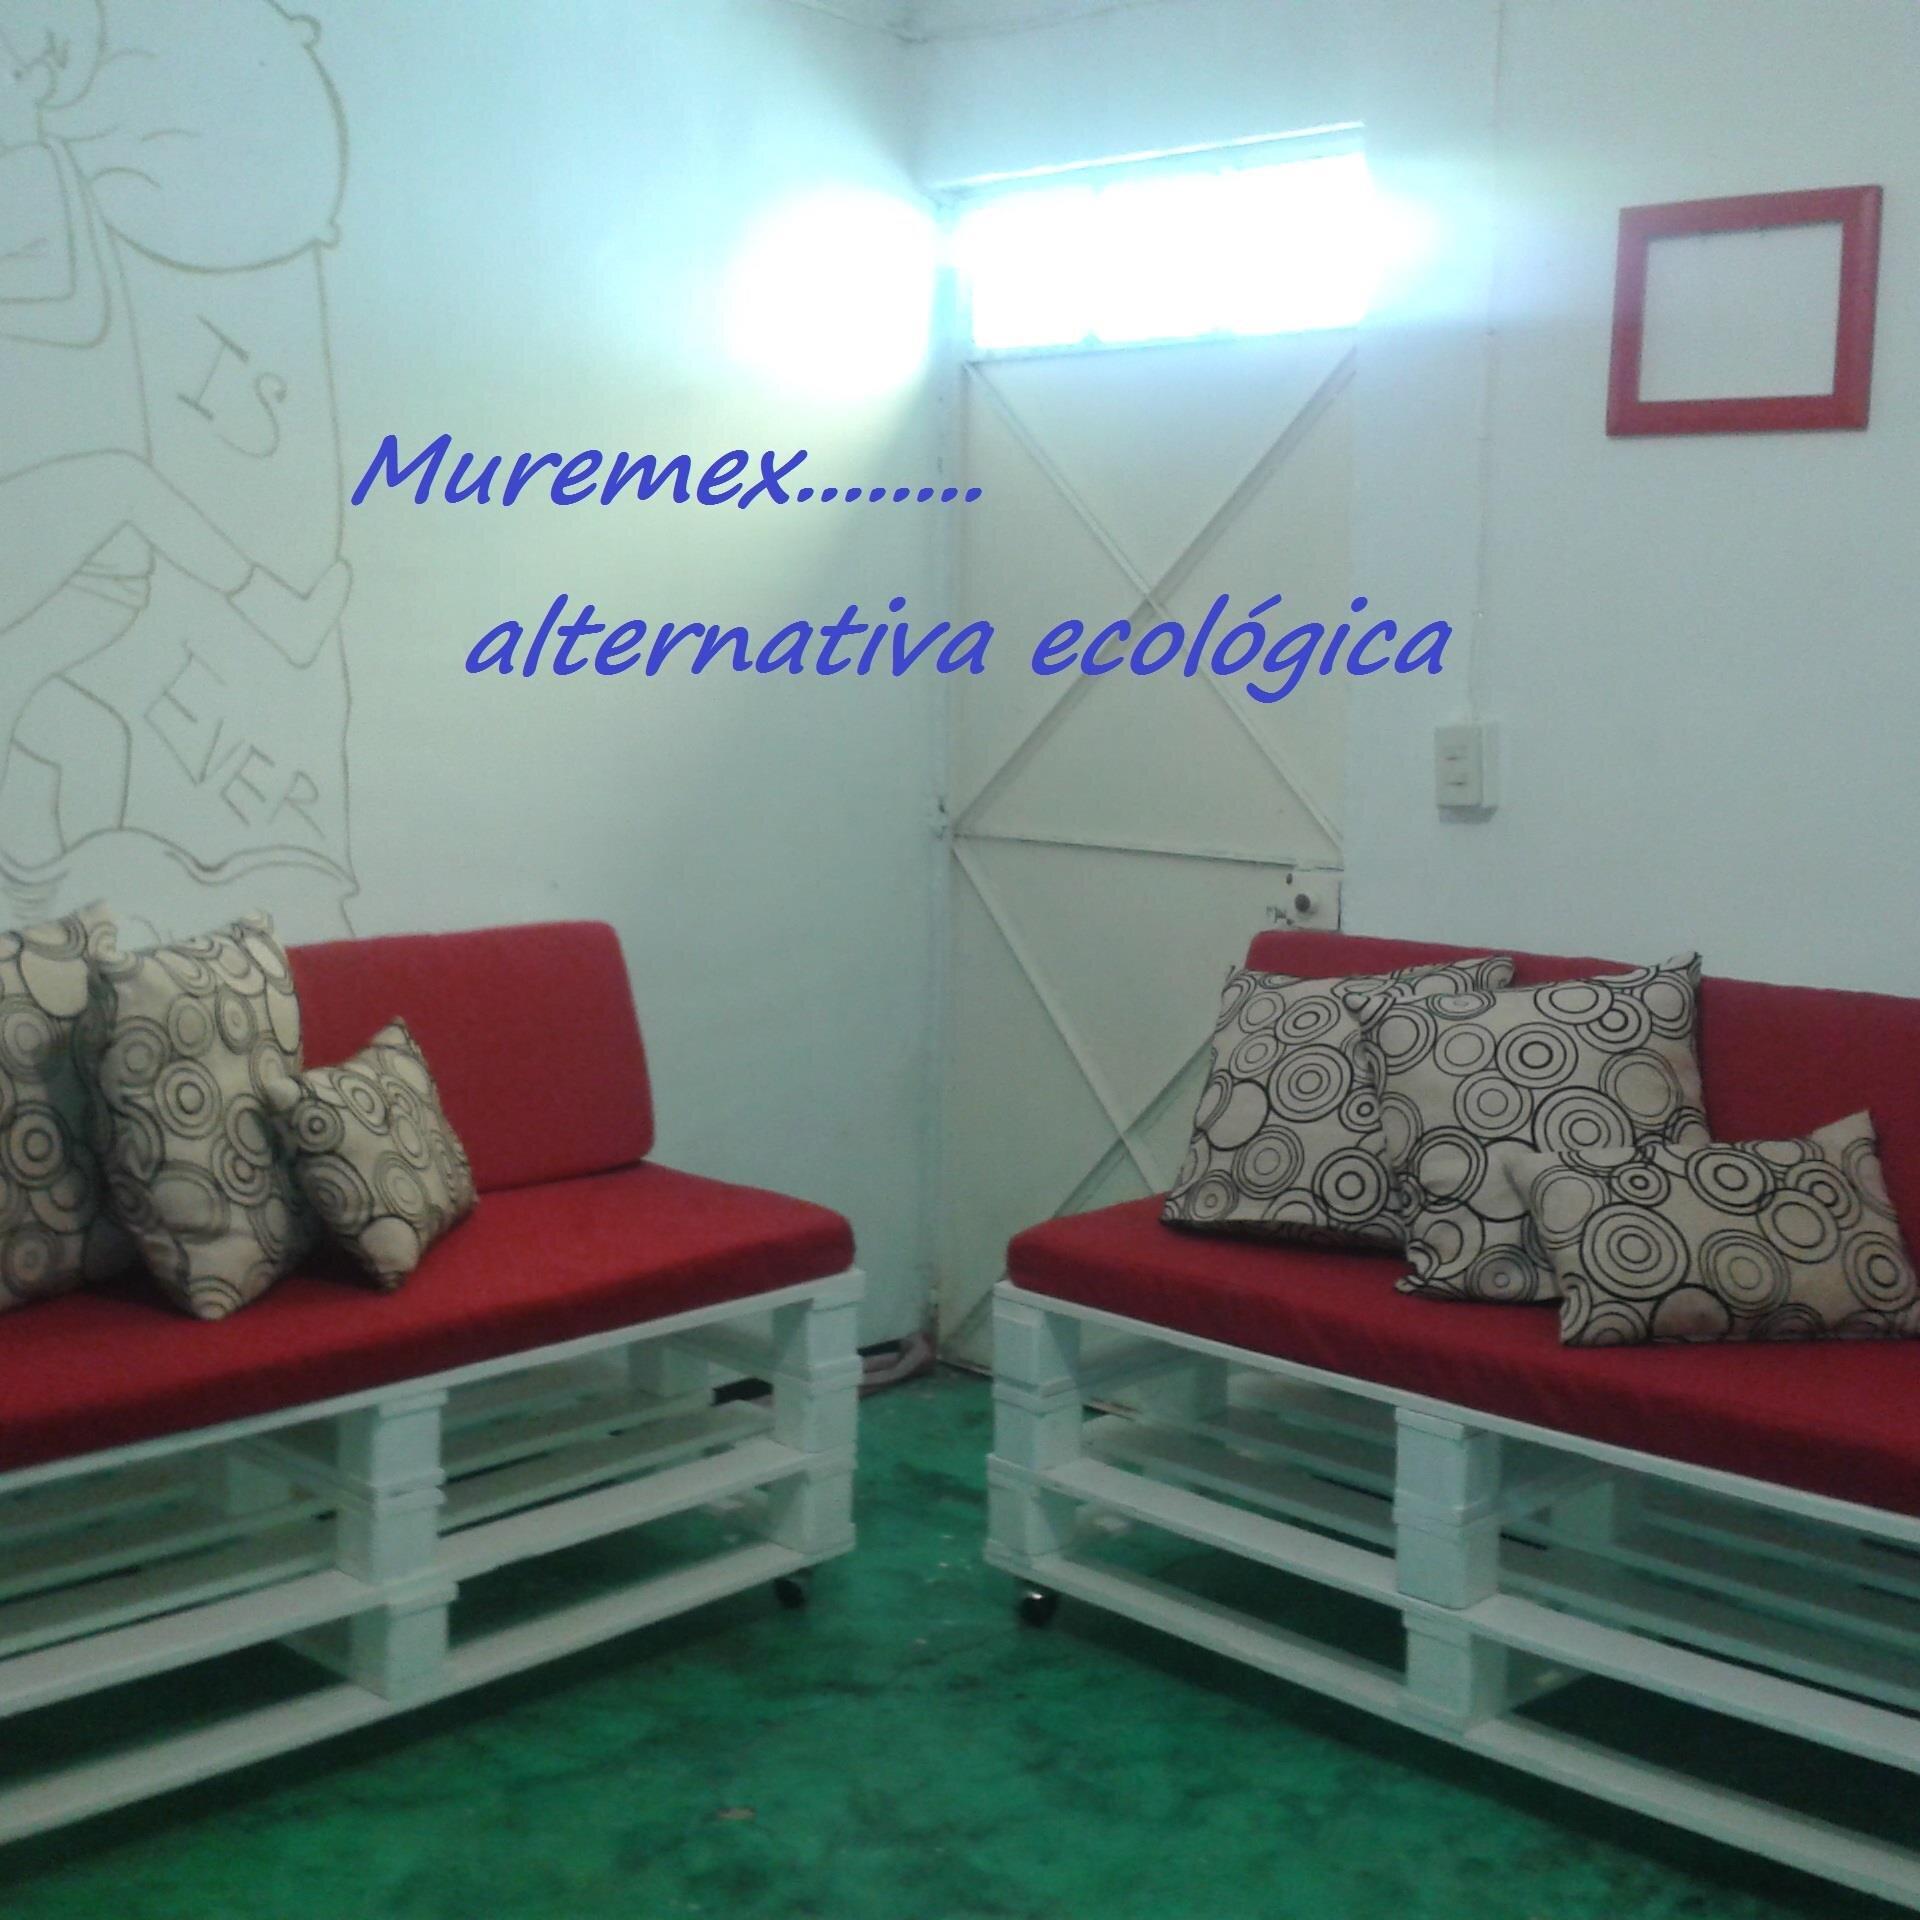 Muebles Con Tarimas Muremex Twitter # Muebles Cin Tarimas